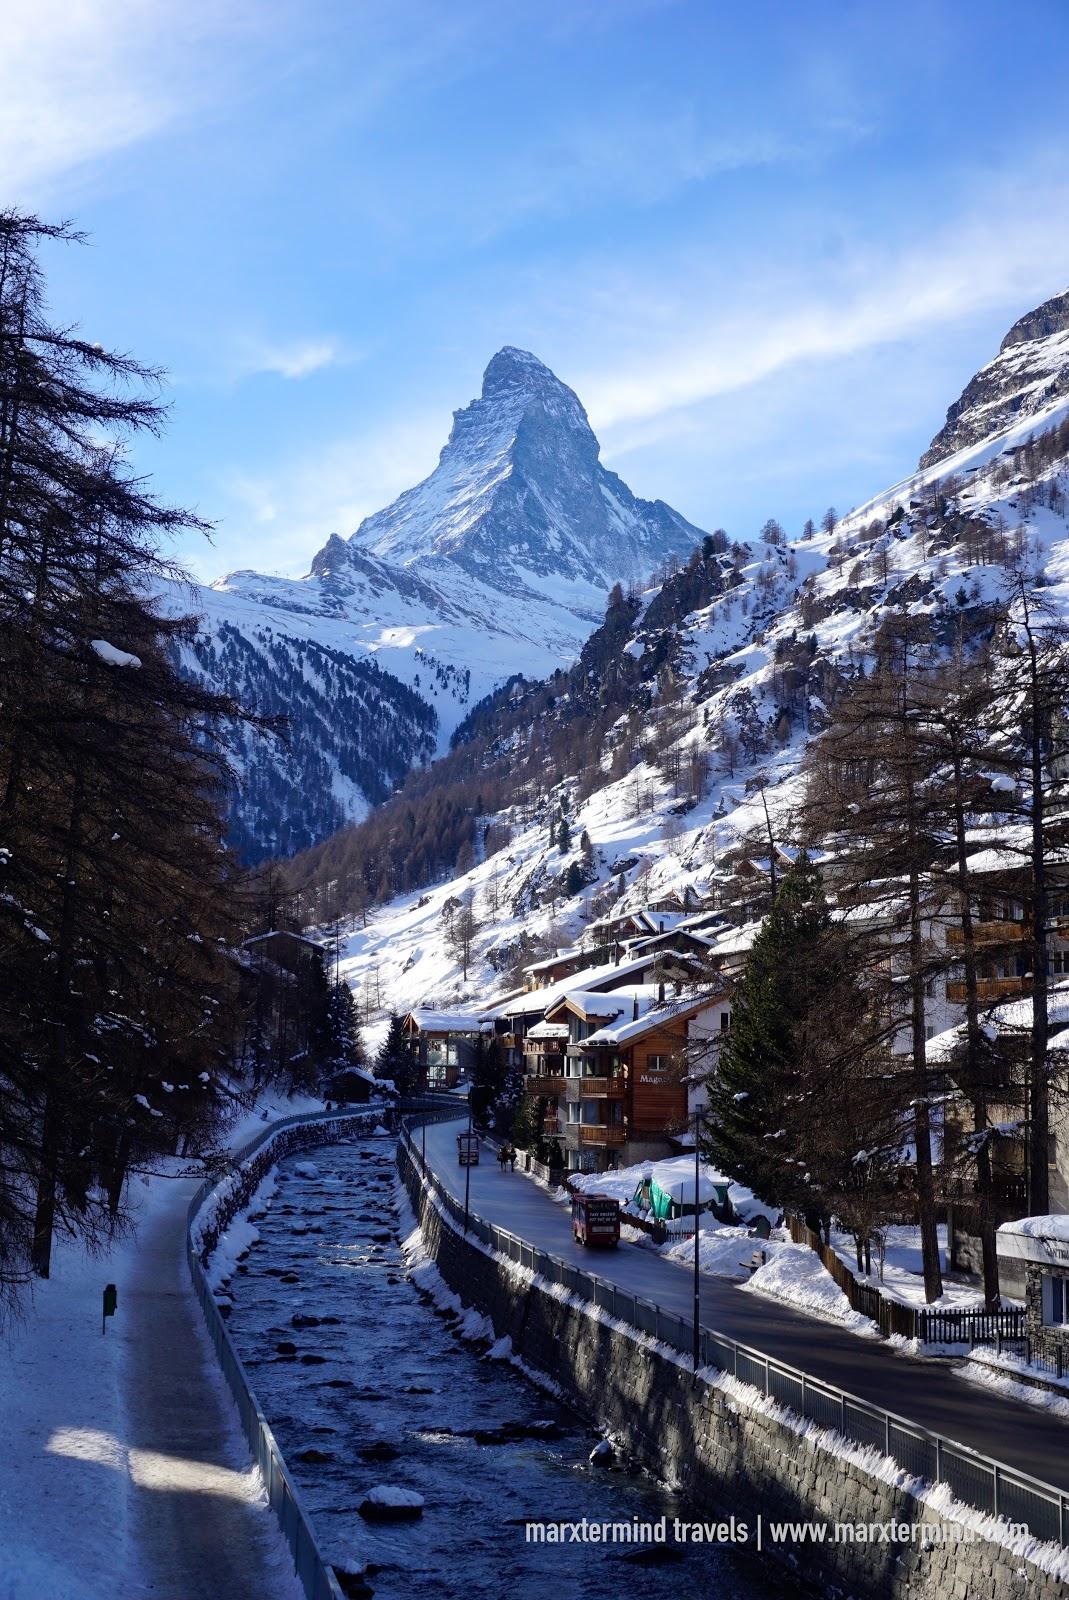 View of Matterhorn in Zermatt